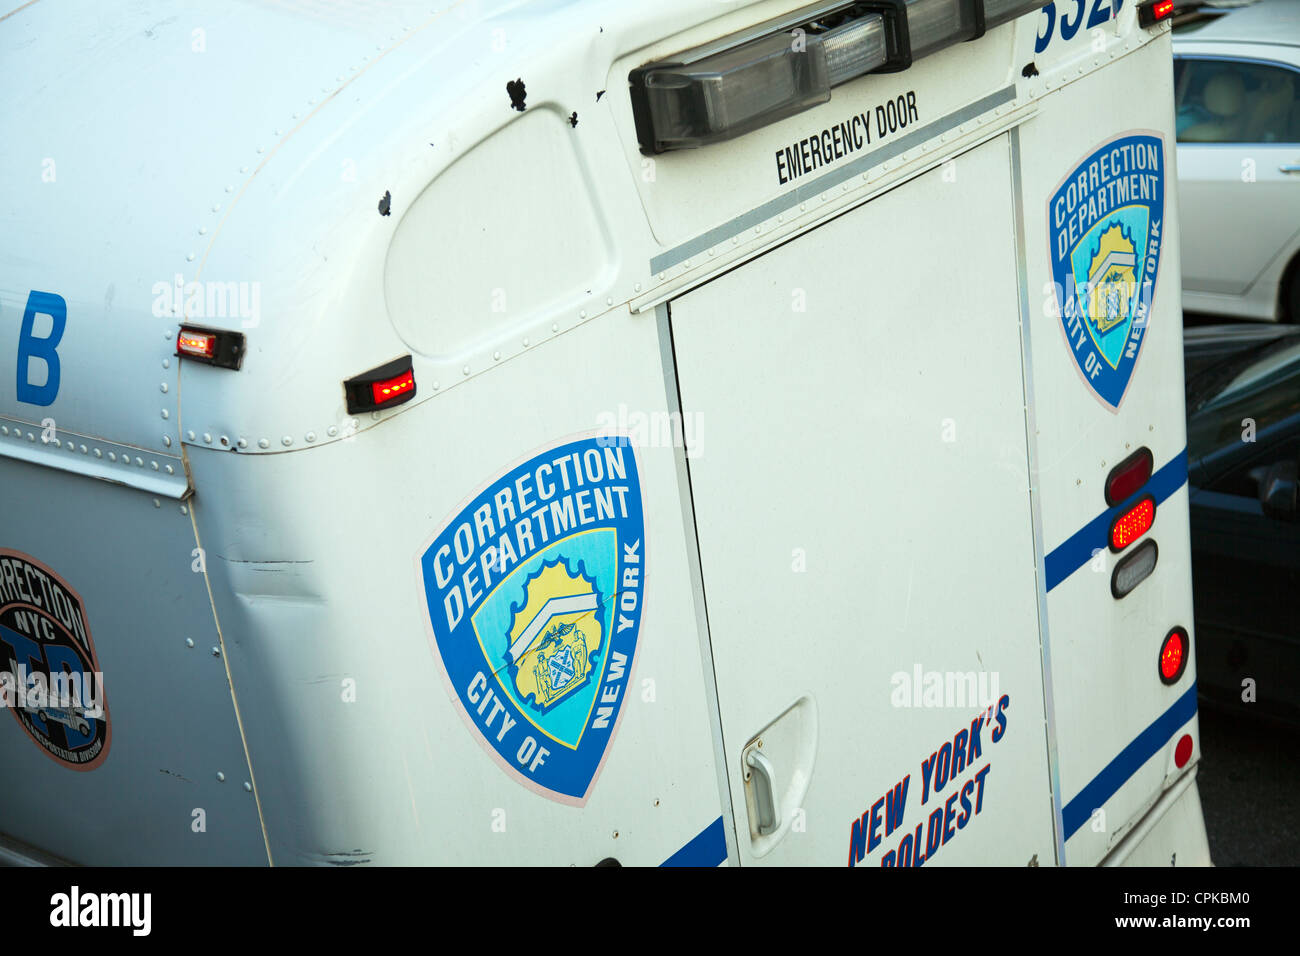 NYPD correction department city of New York felon transportation vehicle - Stock Image